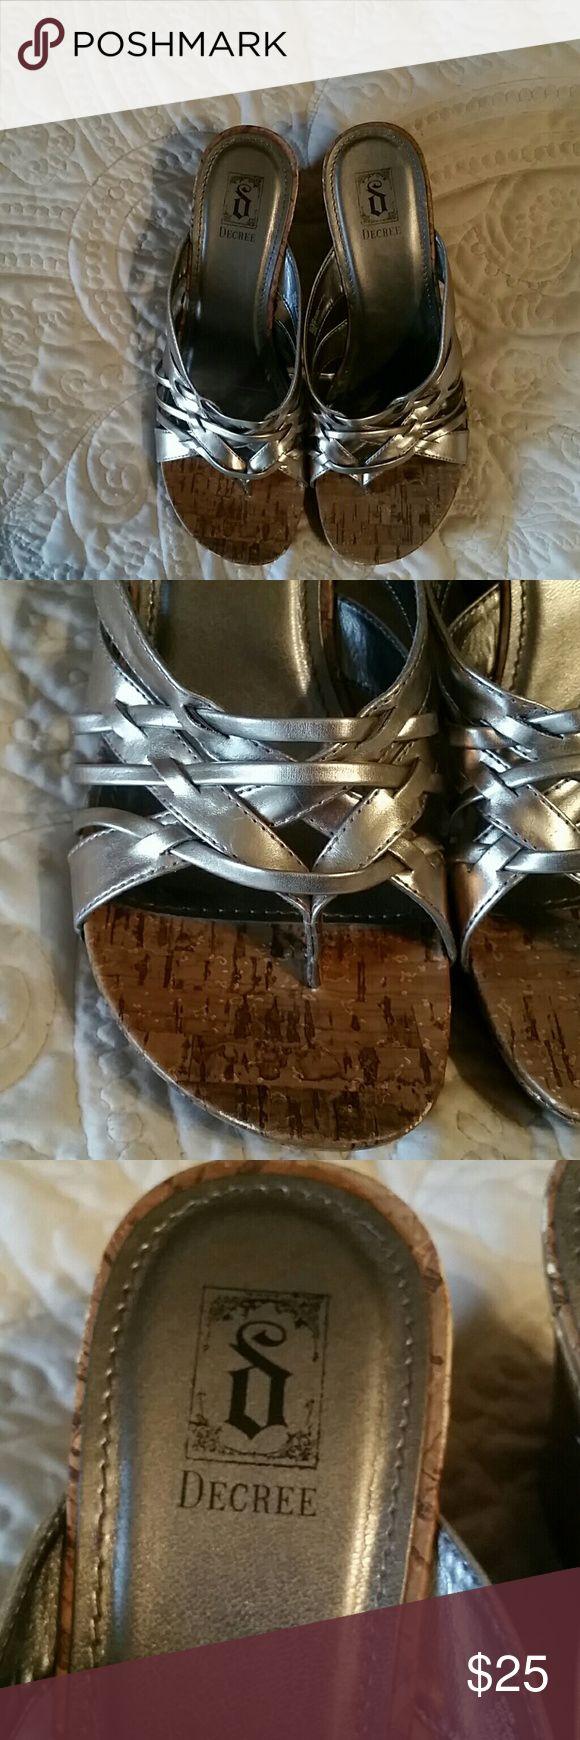 Metallic cork wedges NWOT Silver metallic with cork wedge. NWOT  beautiful sandal to dress up or down Decree Shoes Wedges